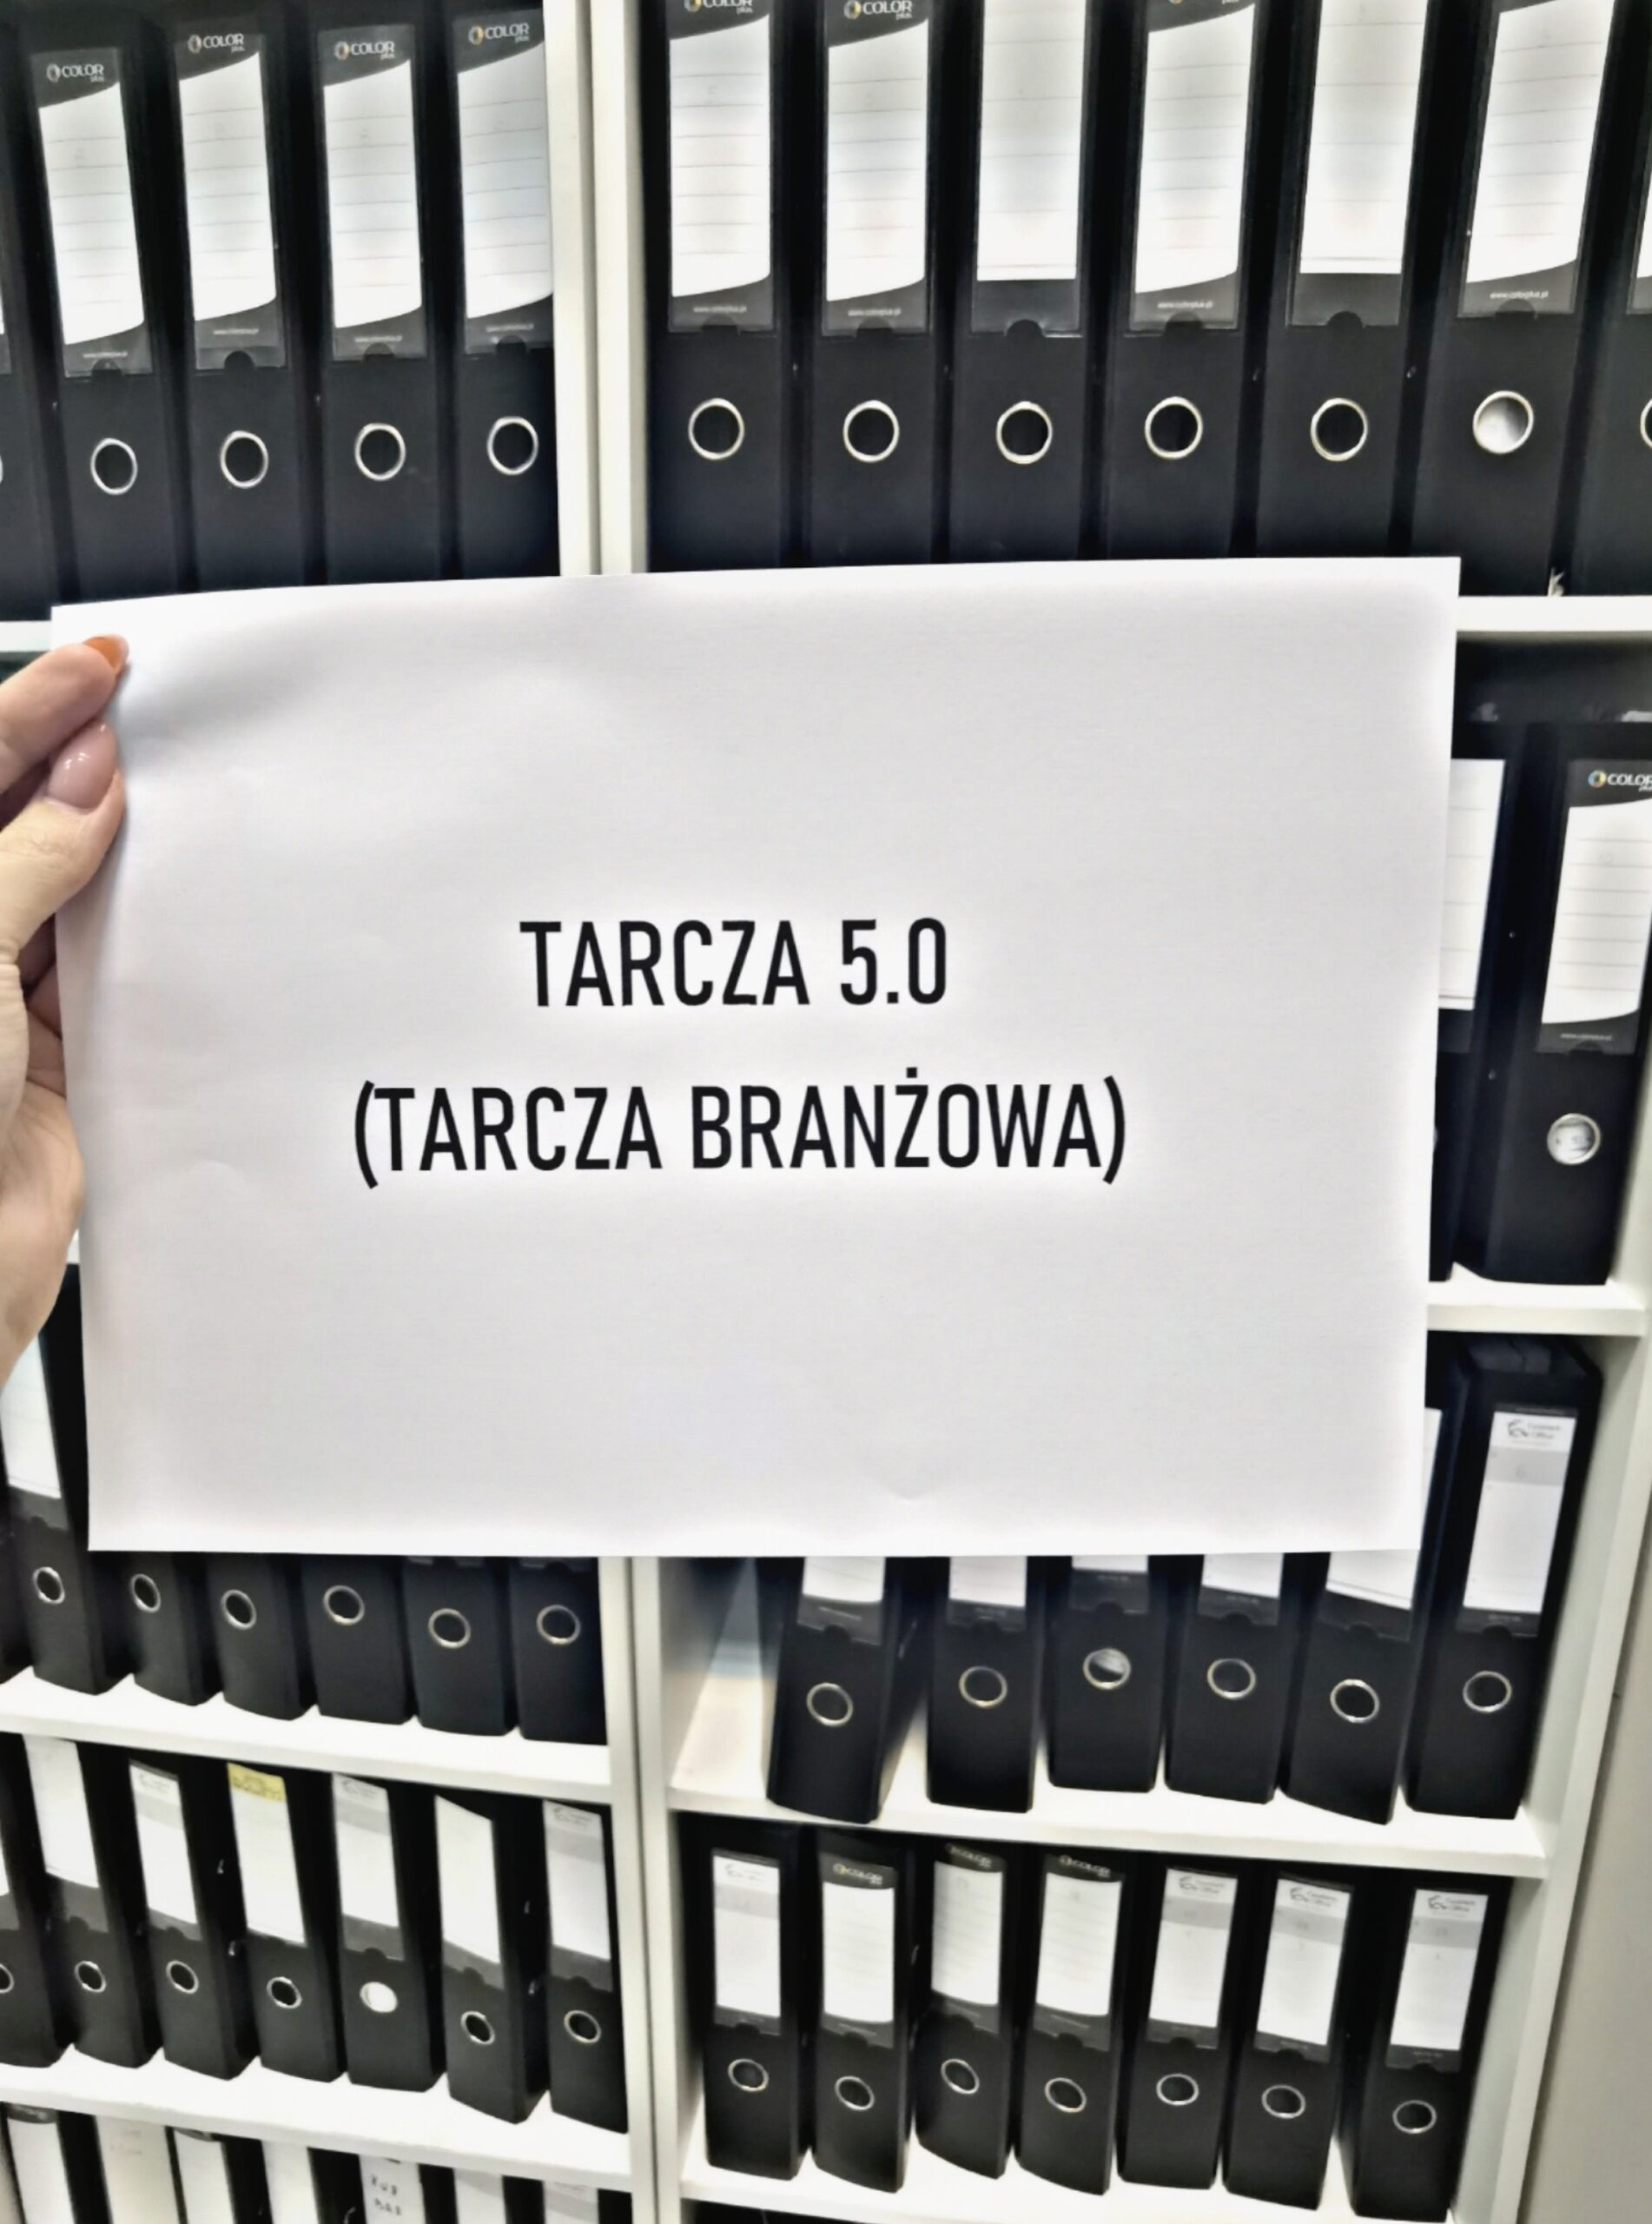 Tarcza 5.0 (tarcza branżowa)